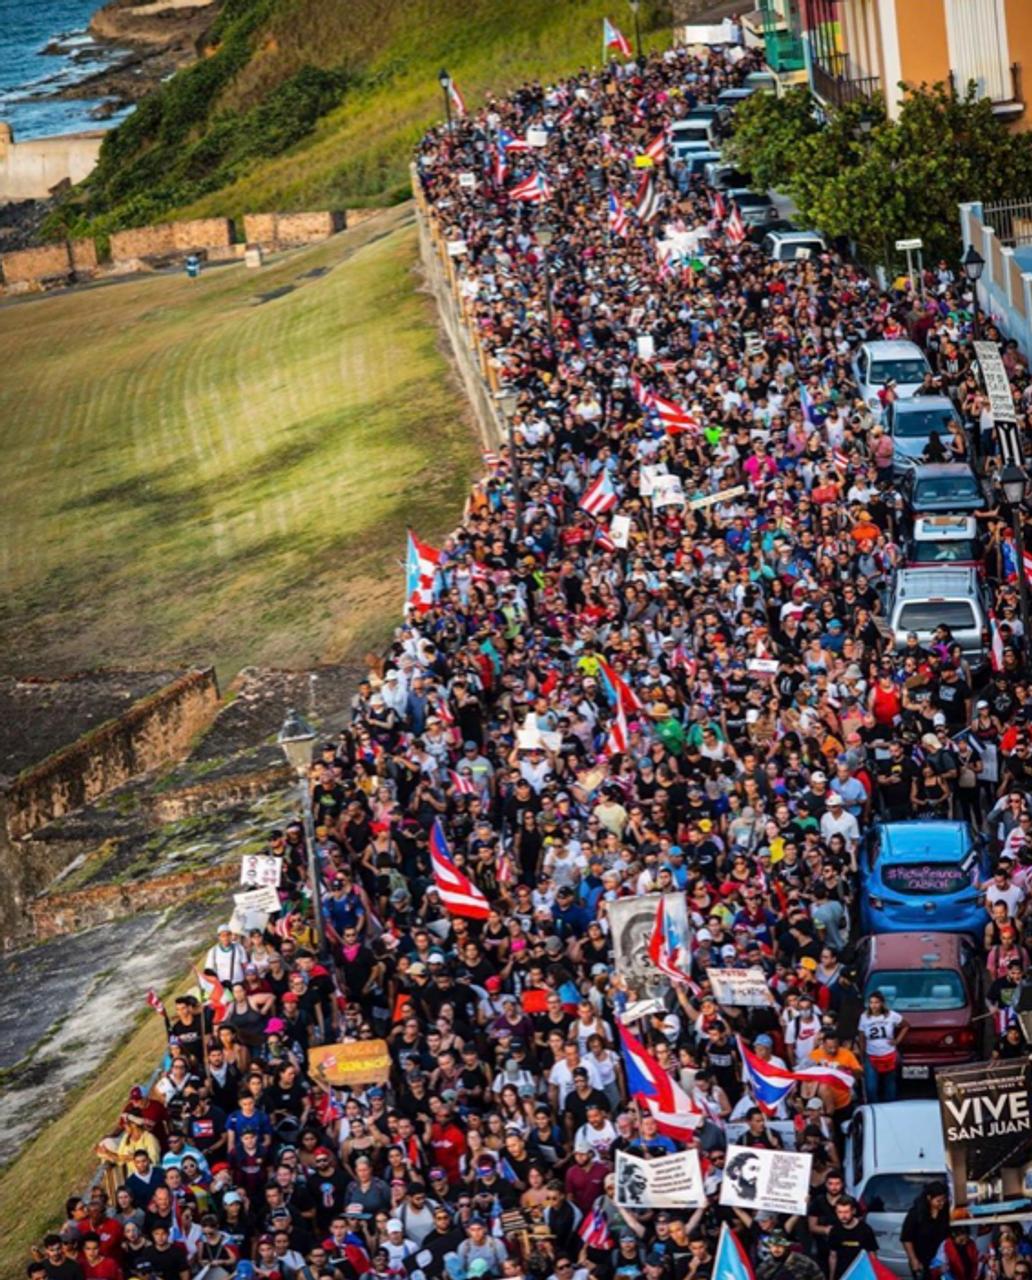 Protesters in San Juan (Source: Twitter Paola Miranda)